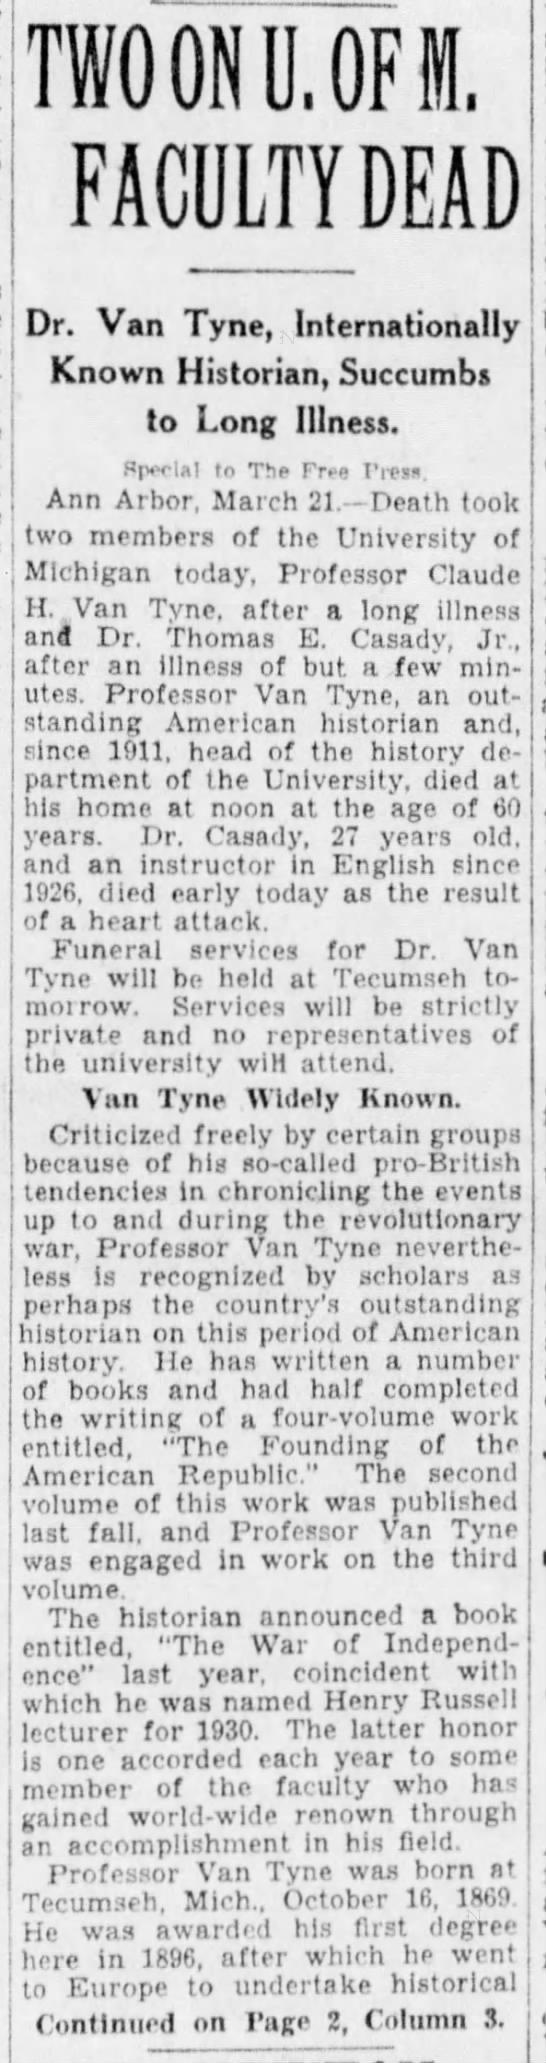 Two on U. of M. Faculty Dead: Dr. Van Tyne, Internationally Known Historian, Succumbs to Long Illnes -